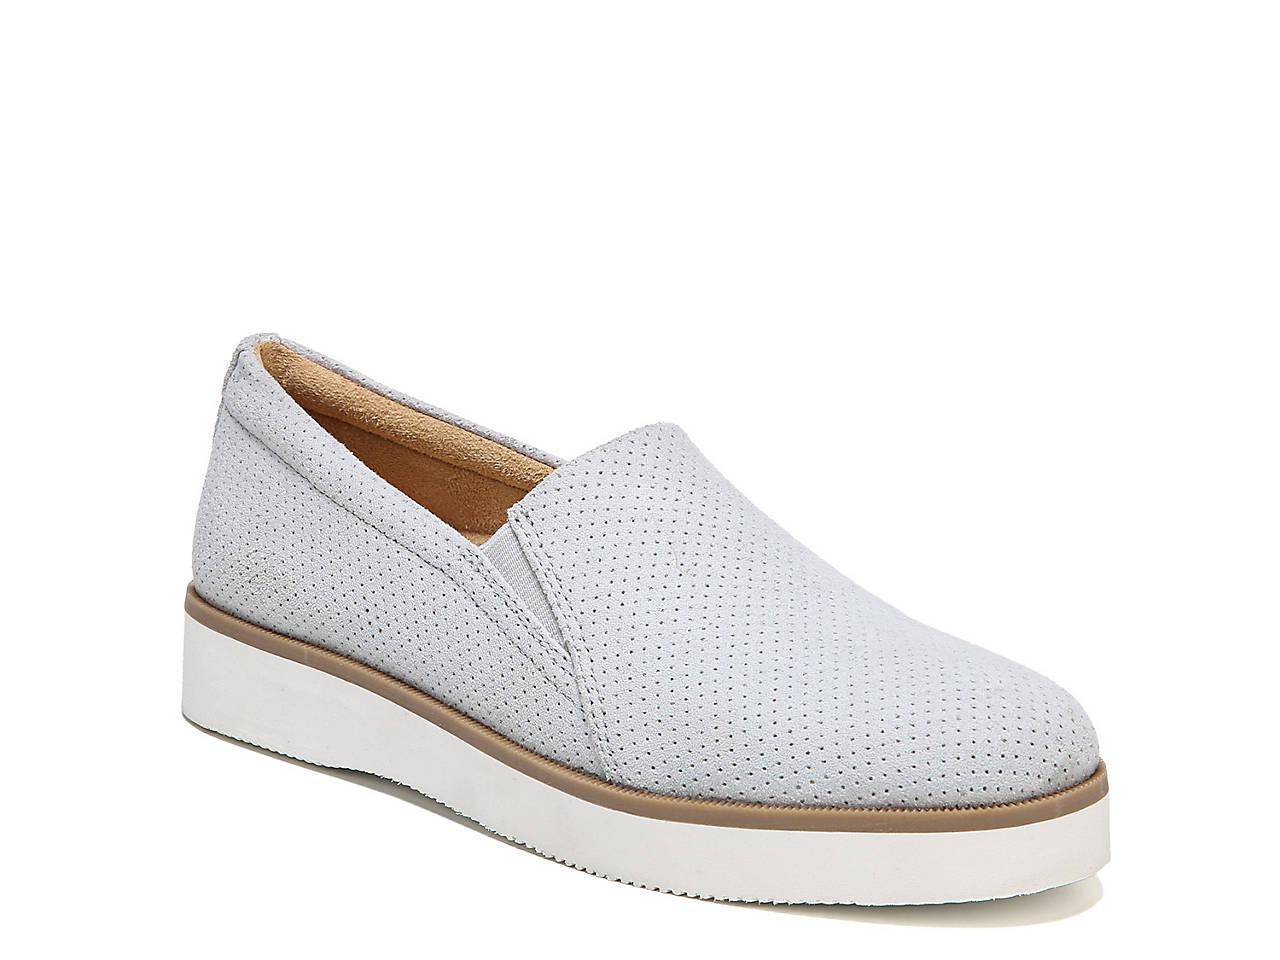 461d1cc3203 Naturalizer Zophie 2 Slip-On Sneaker Women s Shoes